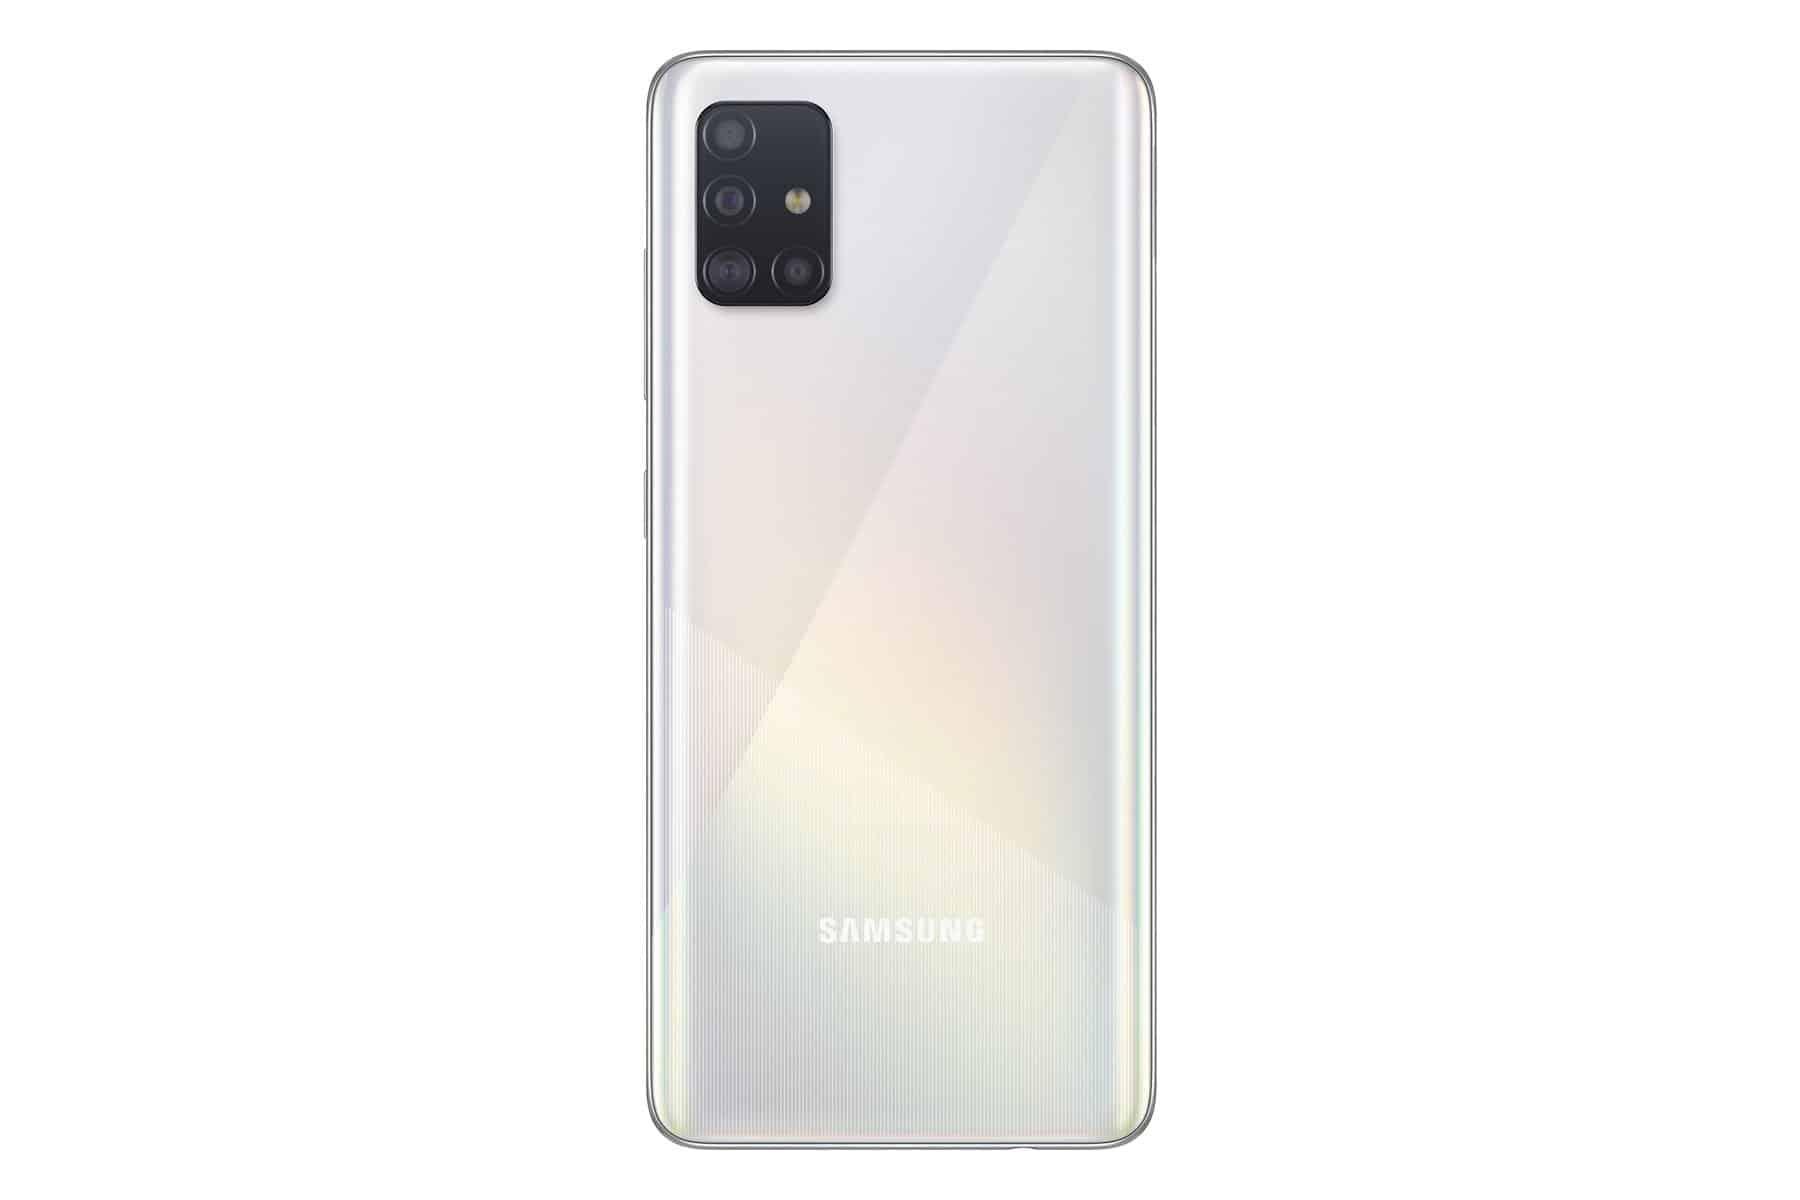 Galaxy A51 image 17